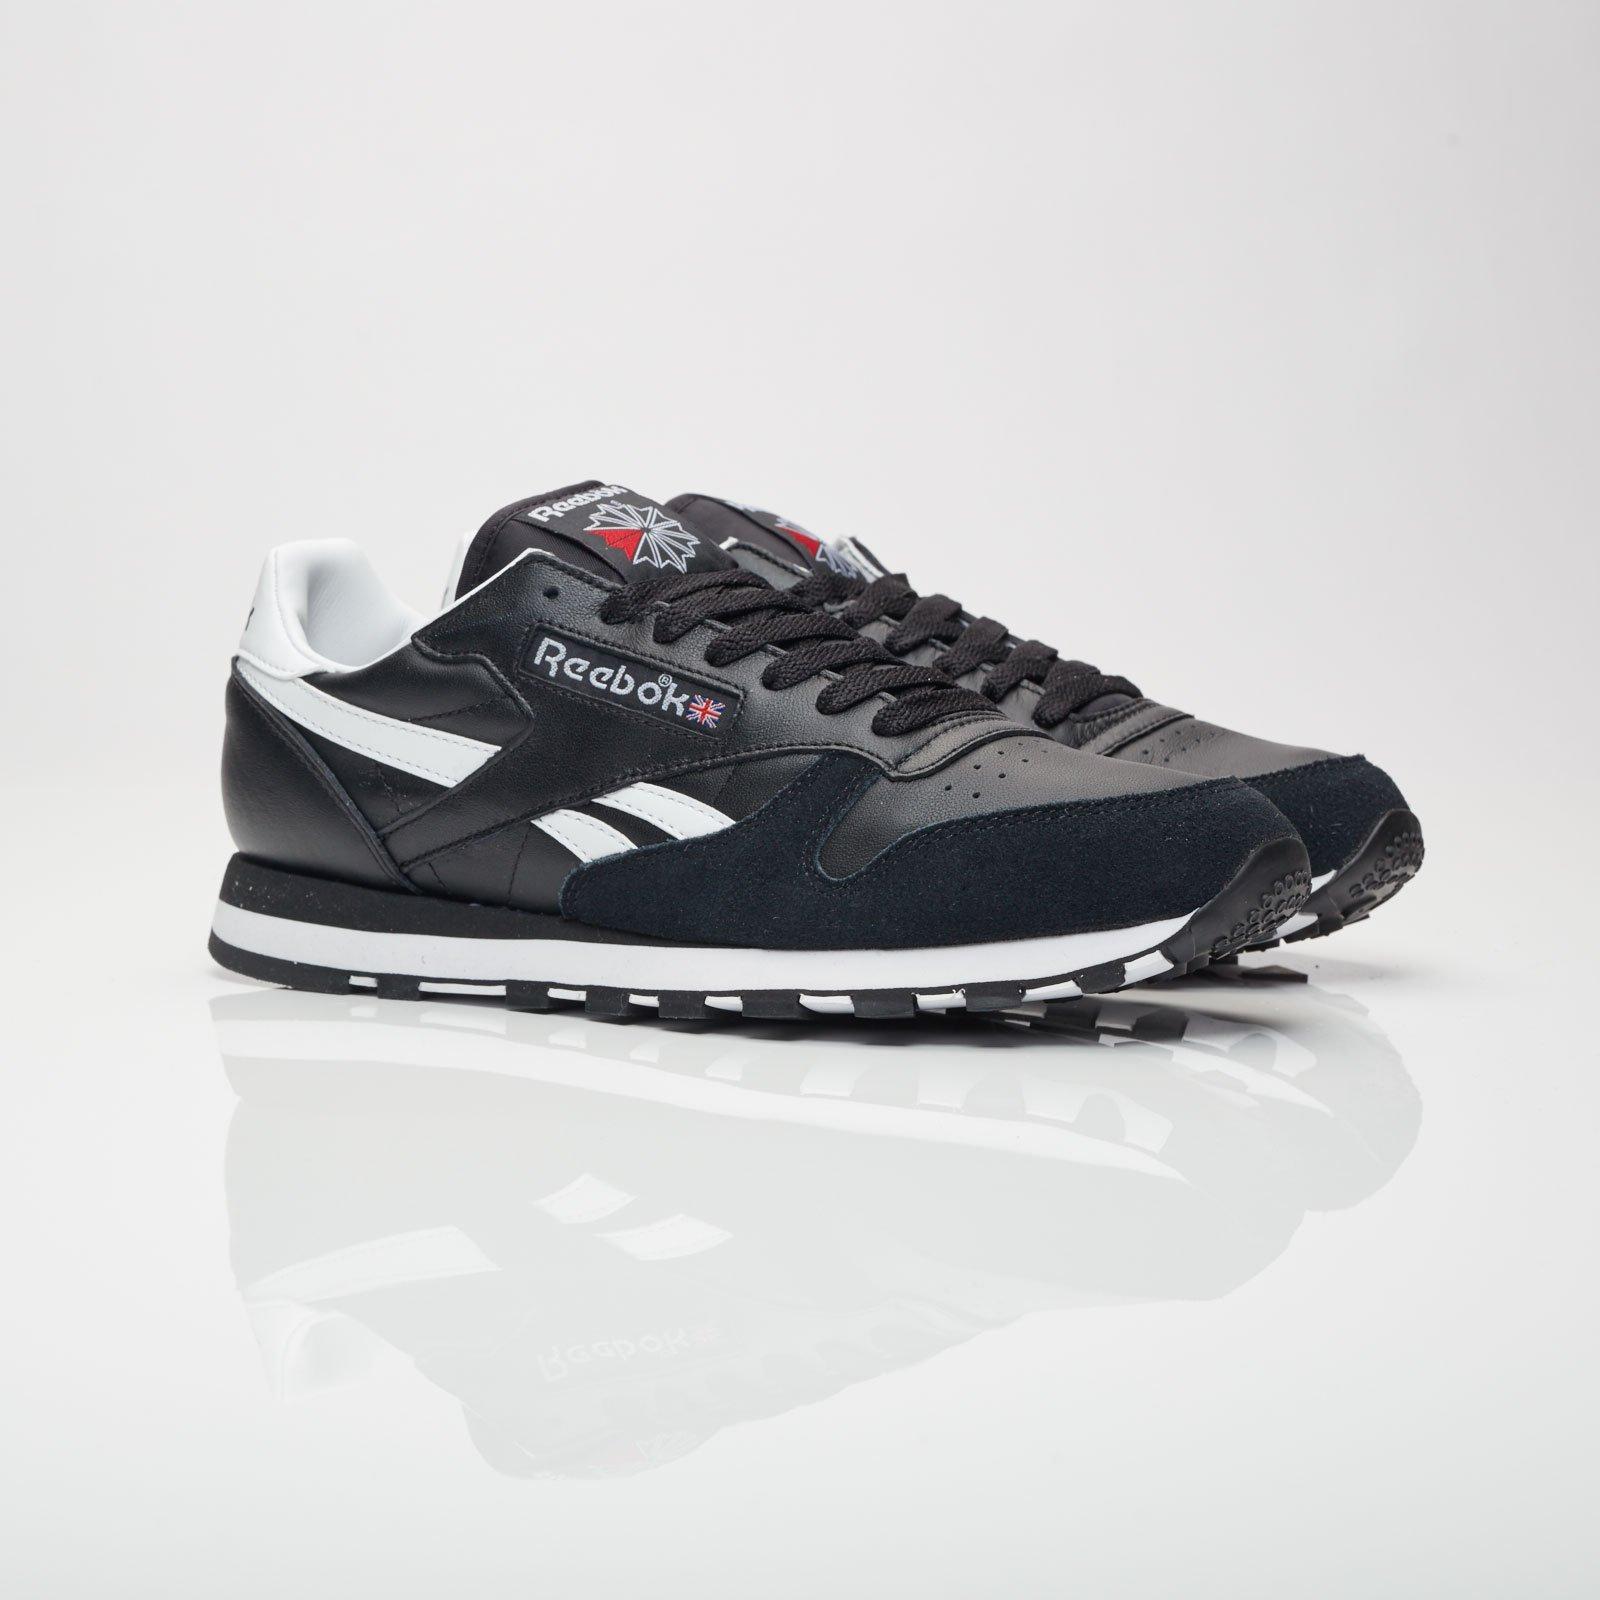 Reebok Classic Leather TRC Bs6515 Sneakersnstuff